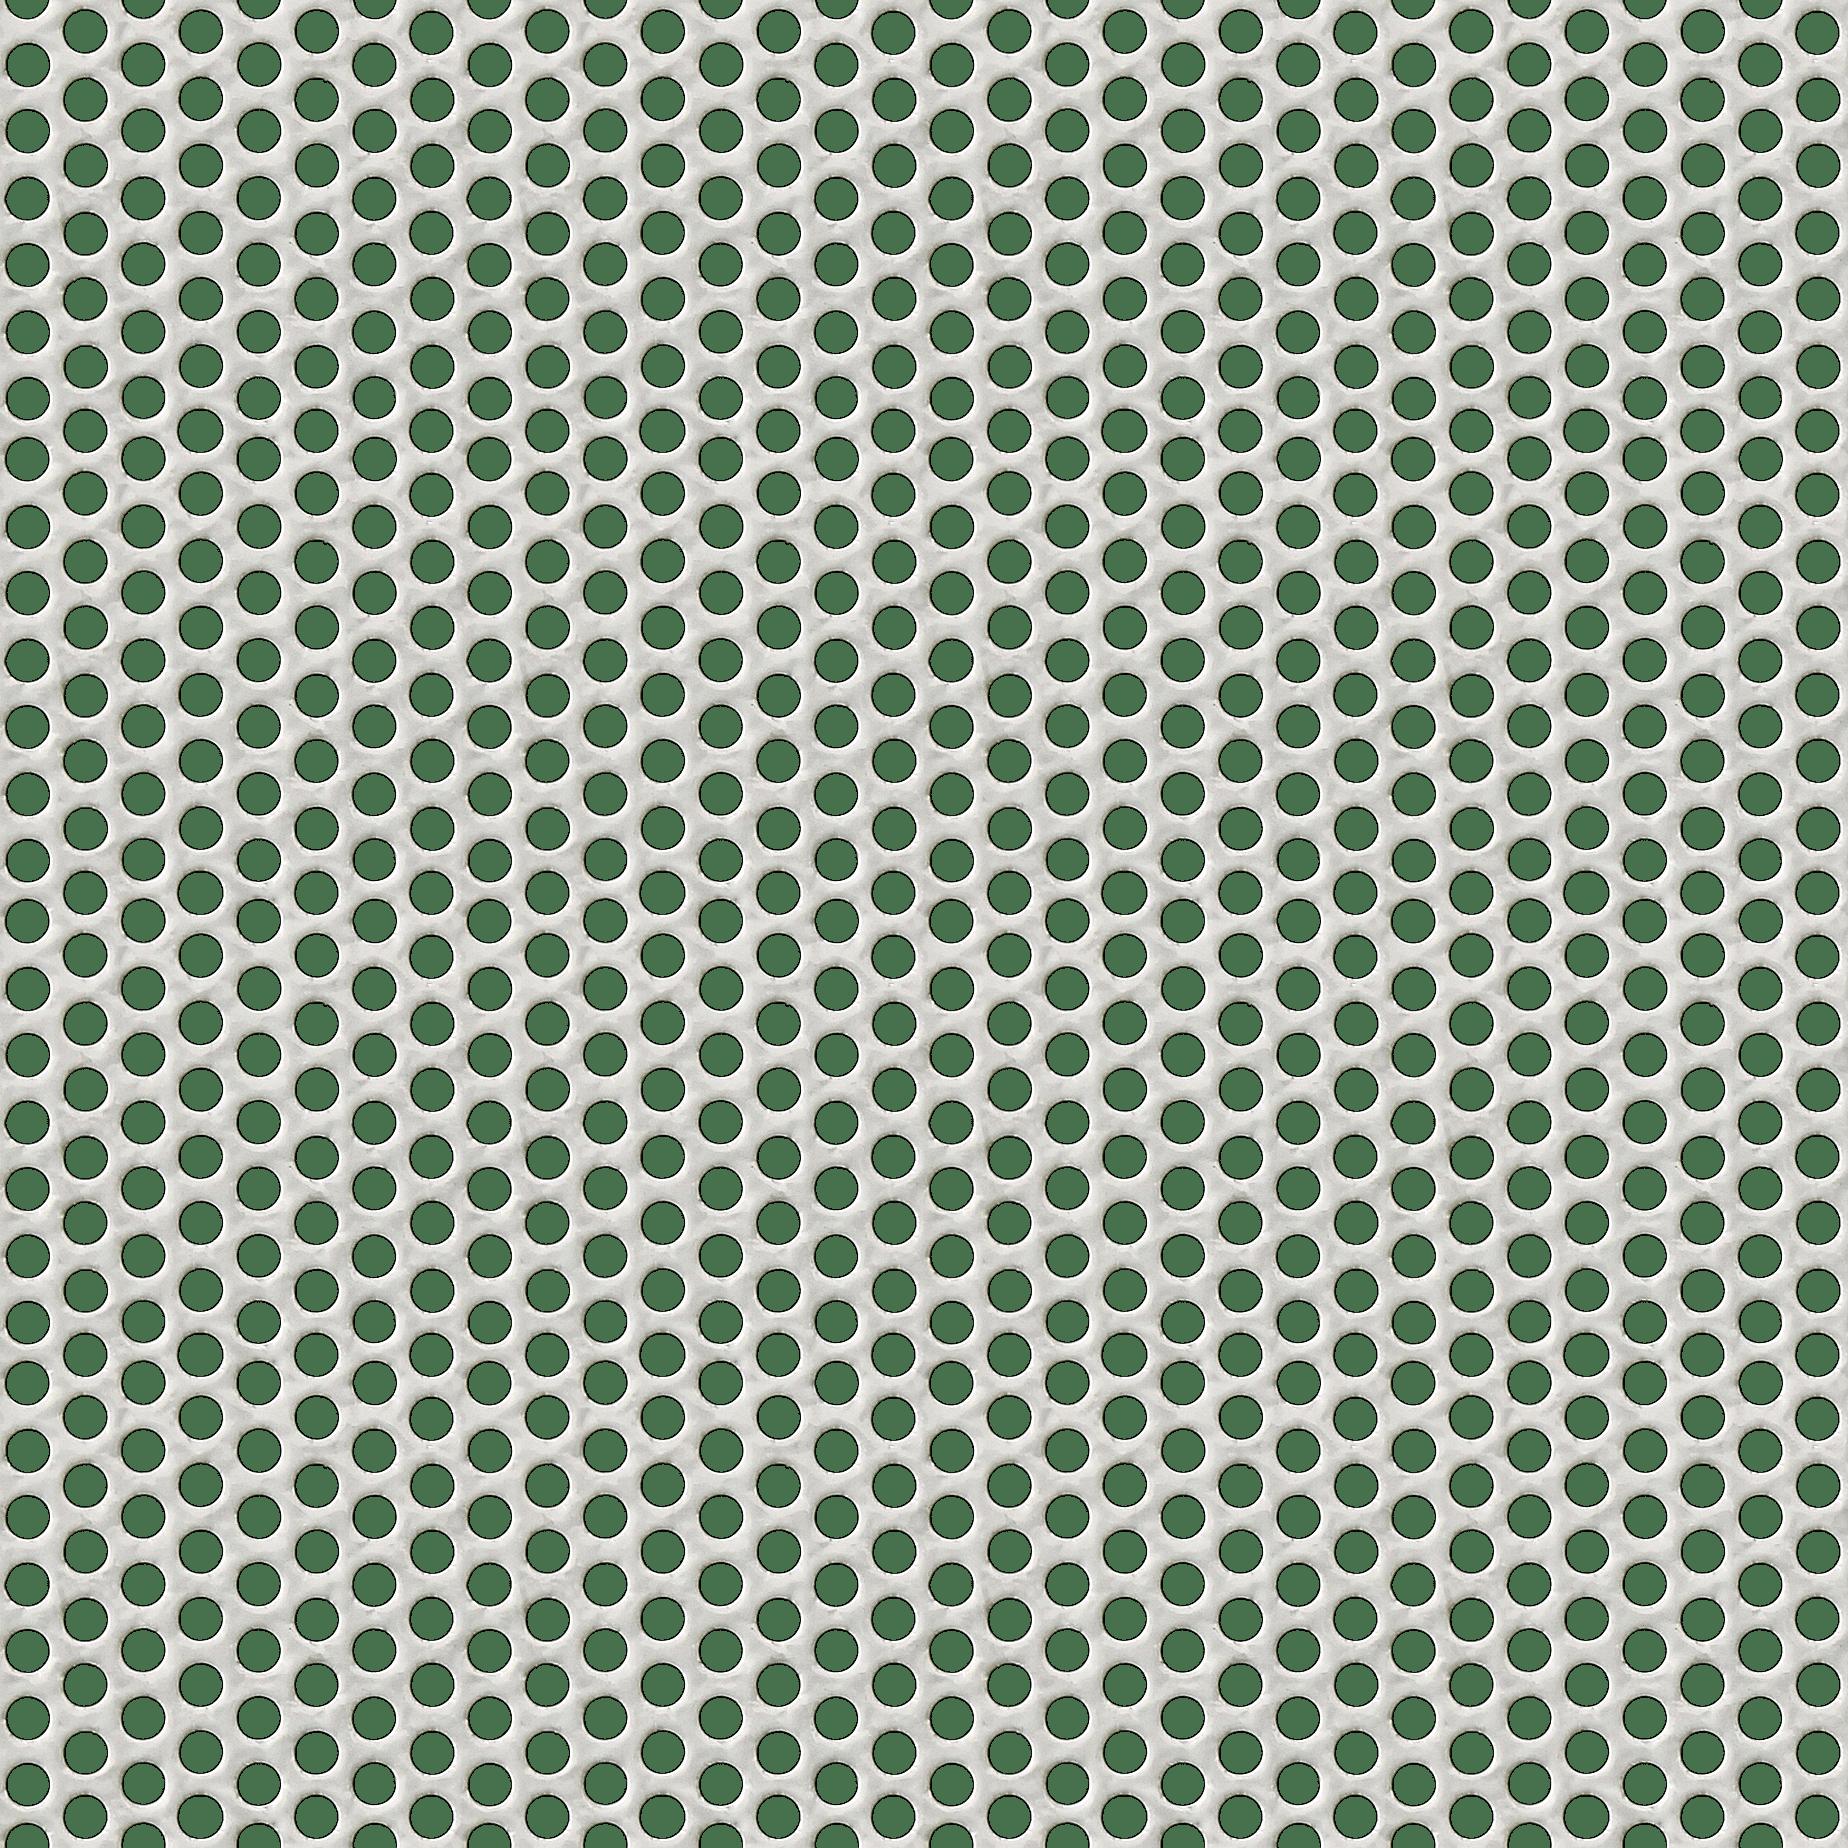 Perforated Metal Sheet Seamless Texture - Dots Pattern ...